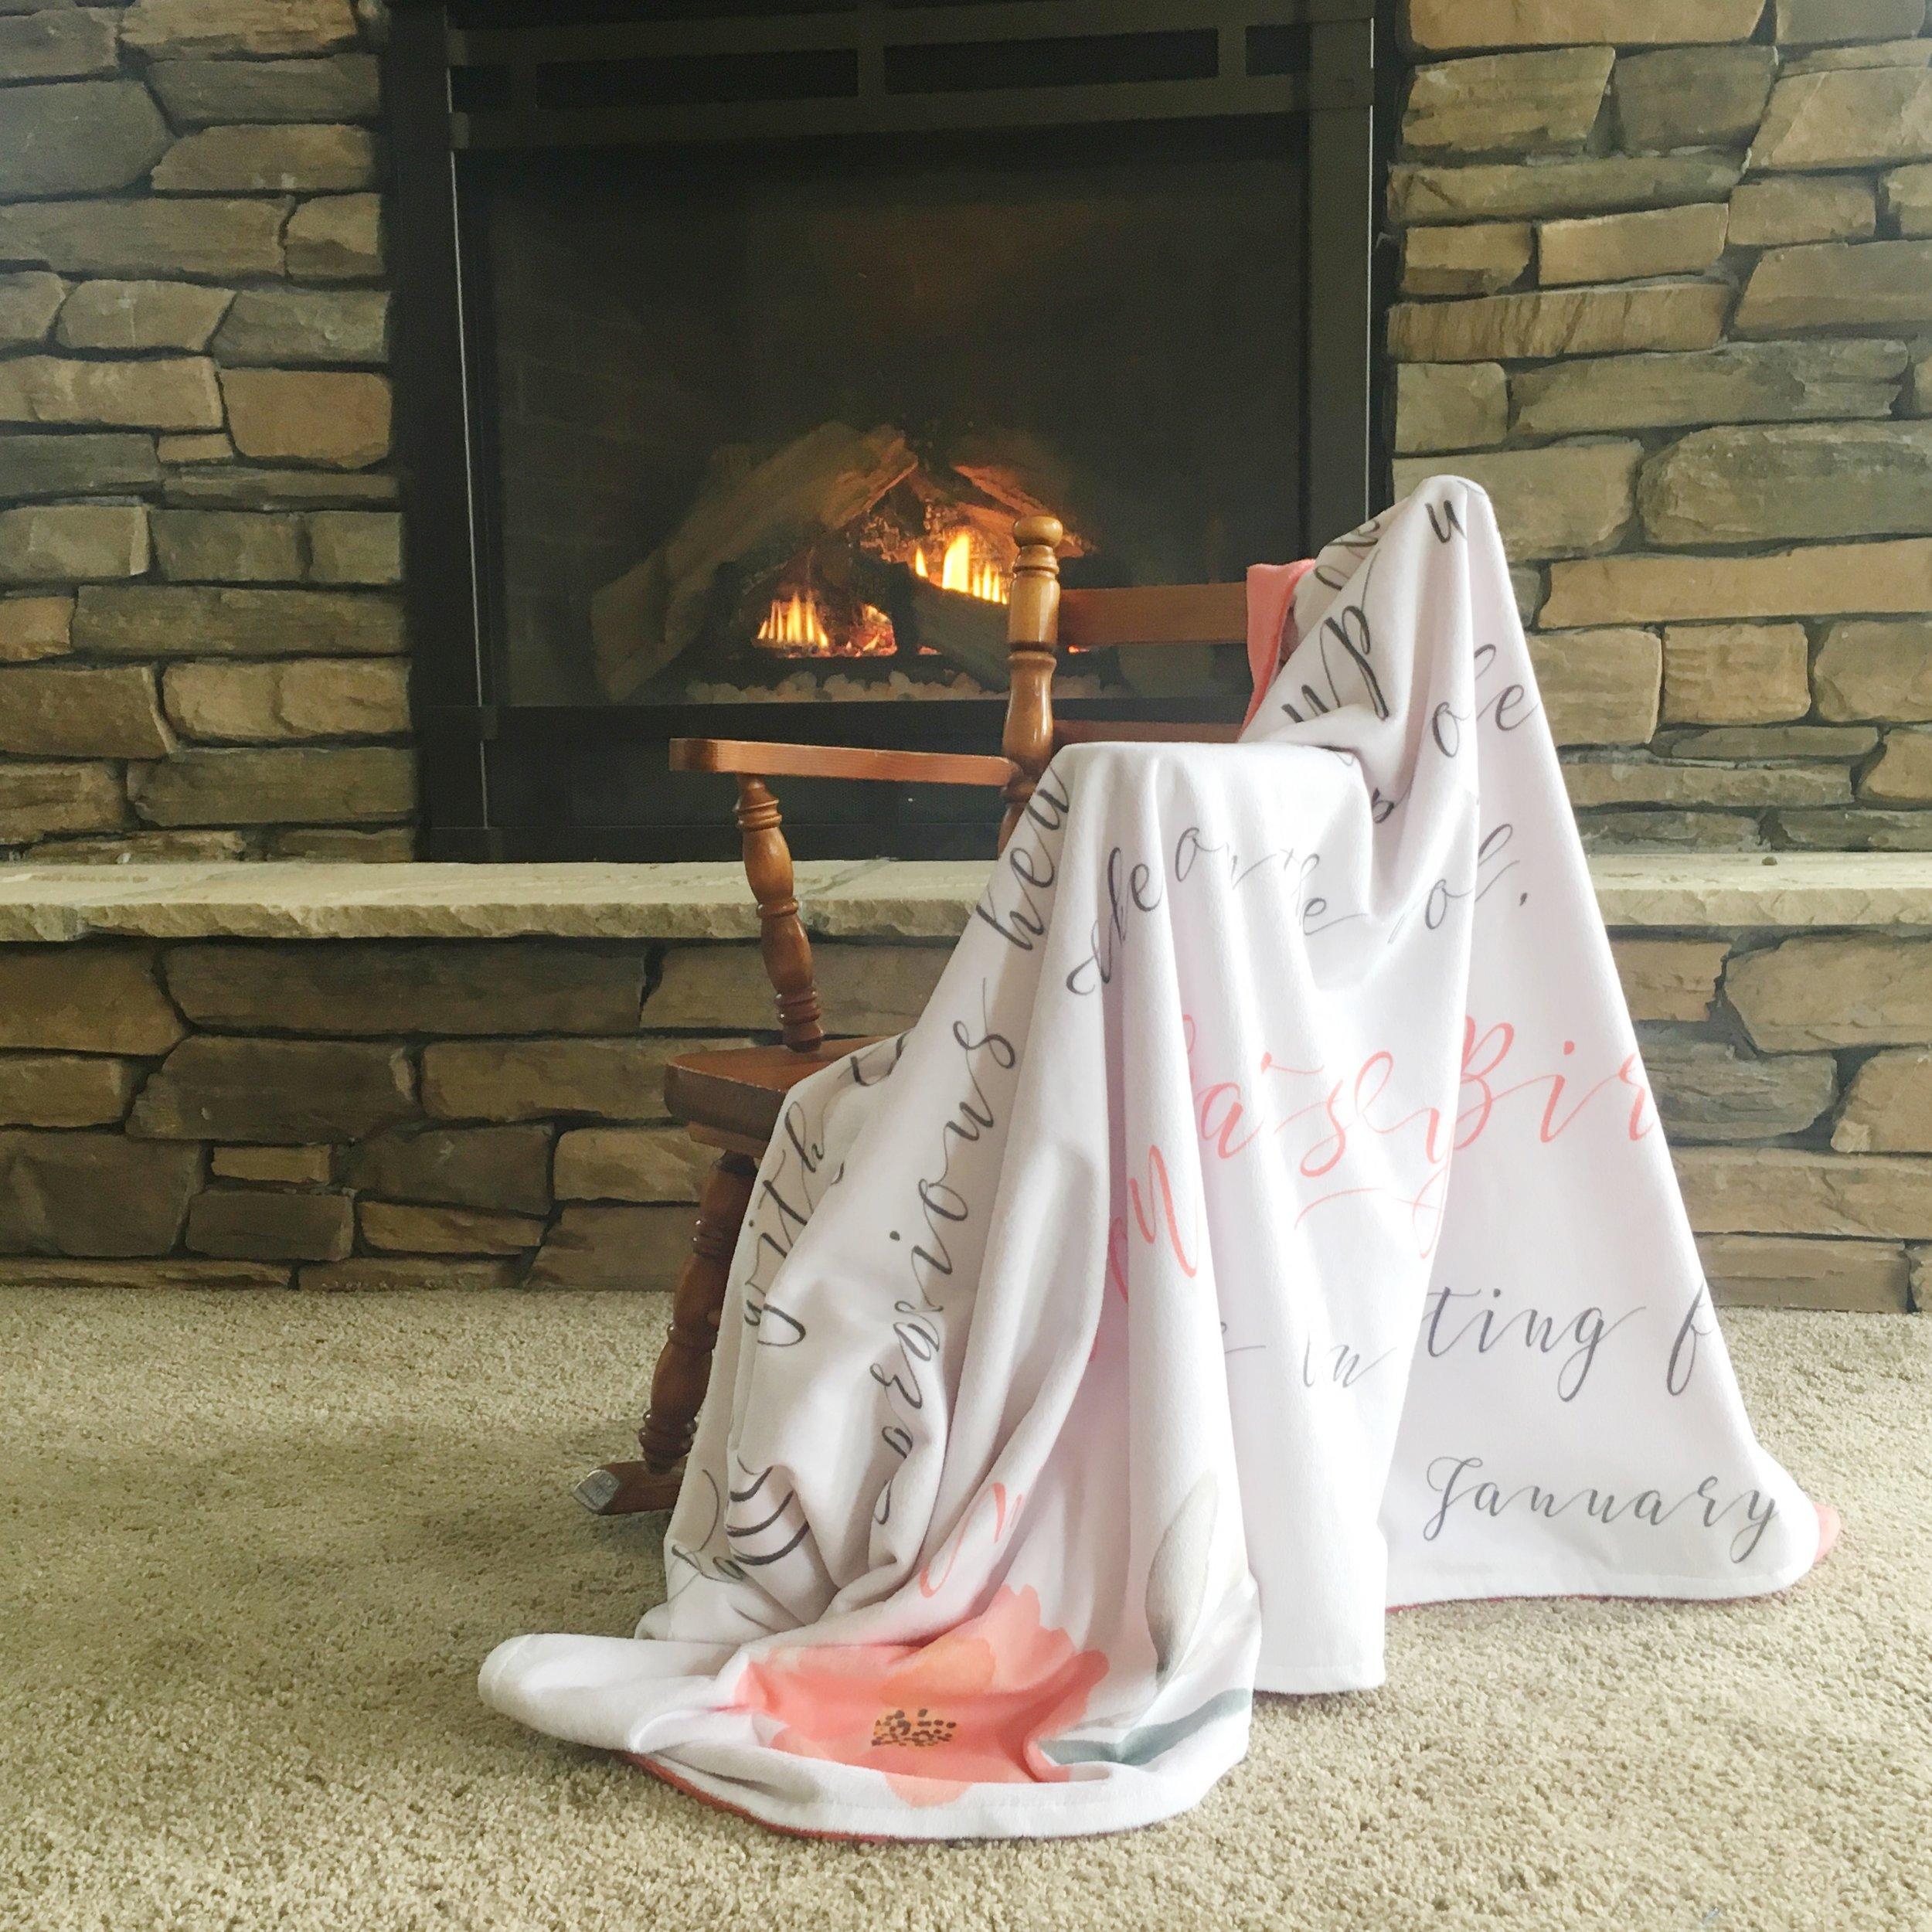 Central PA, Baby Blanket, Hand lettered, JesSmith Designs, Invitations, custom-03-29 10.46.11.jpg